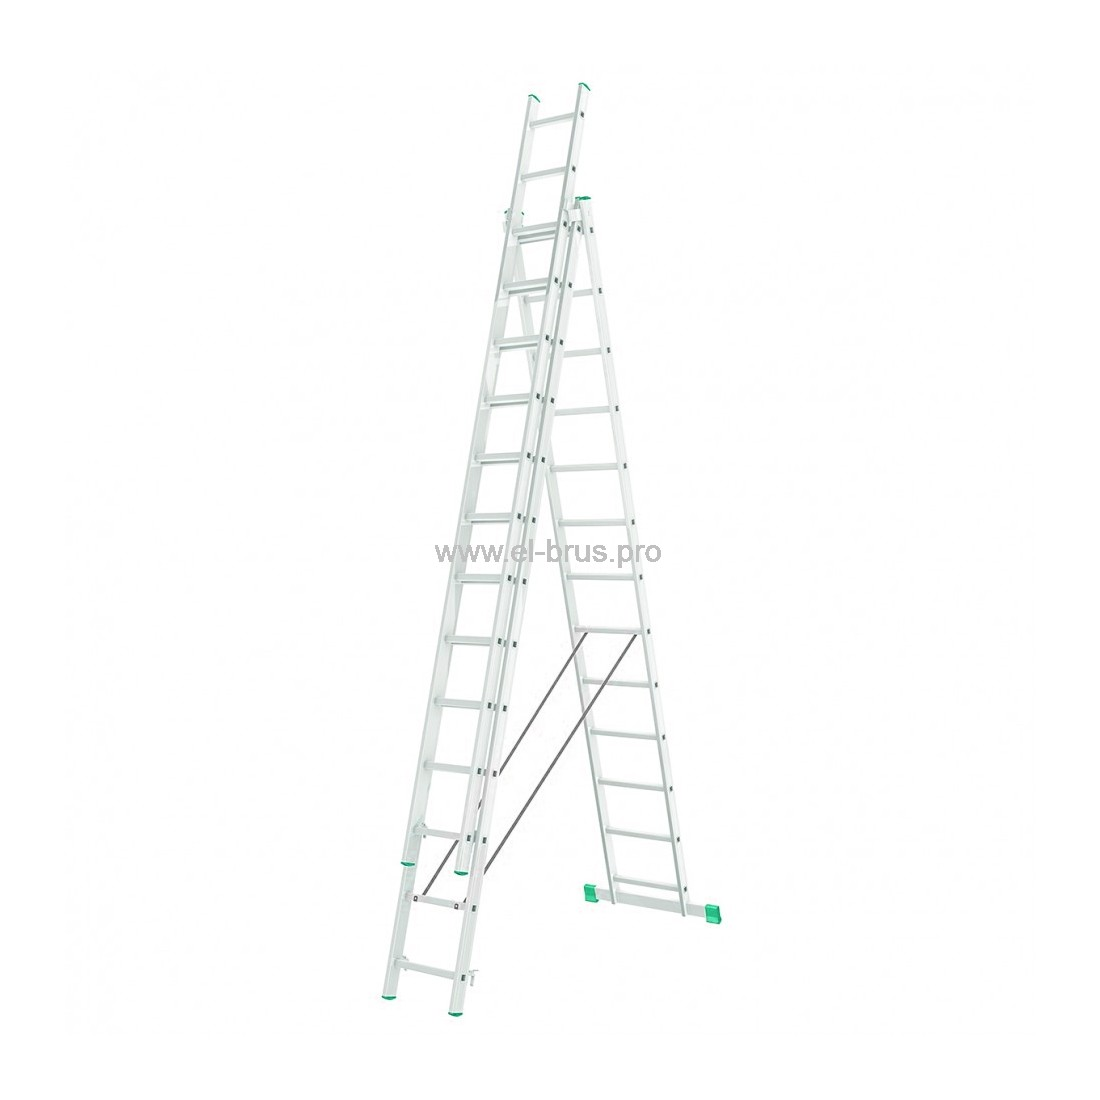 Лестница-стремянка 3-13 трехсекционная LWI